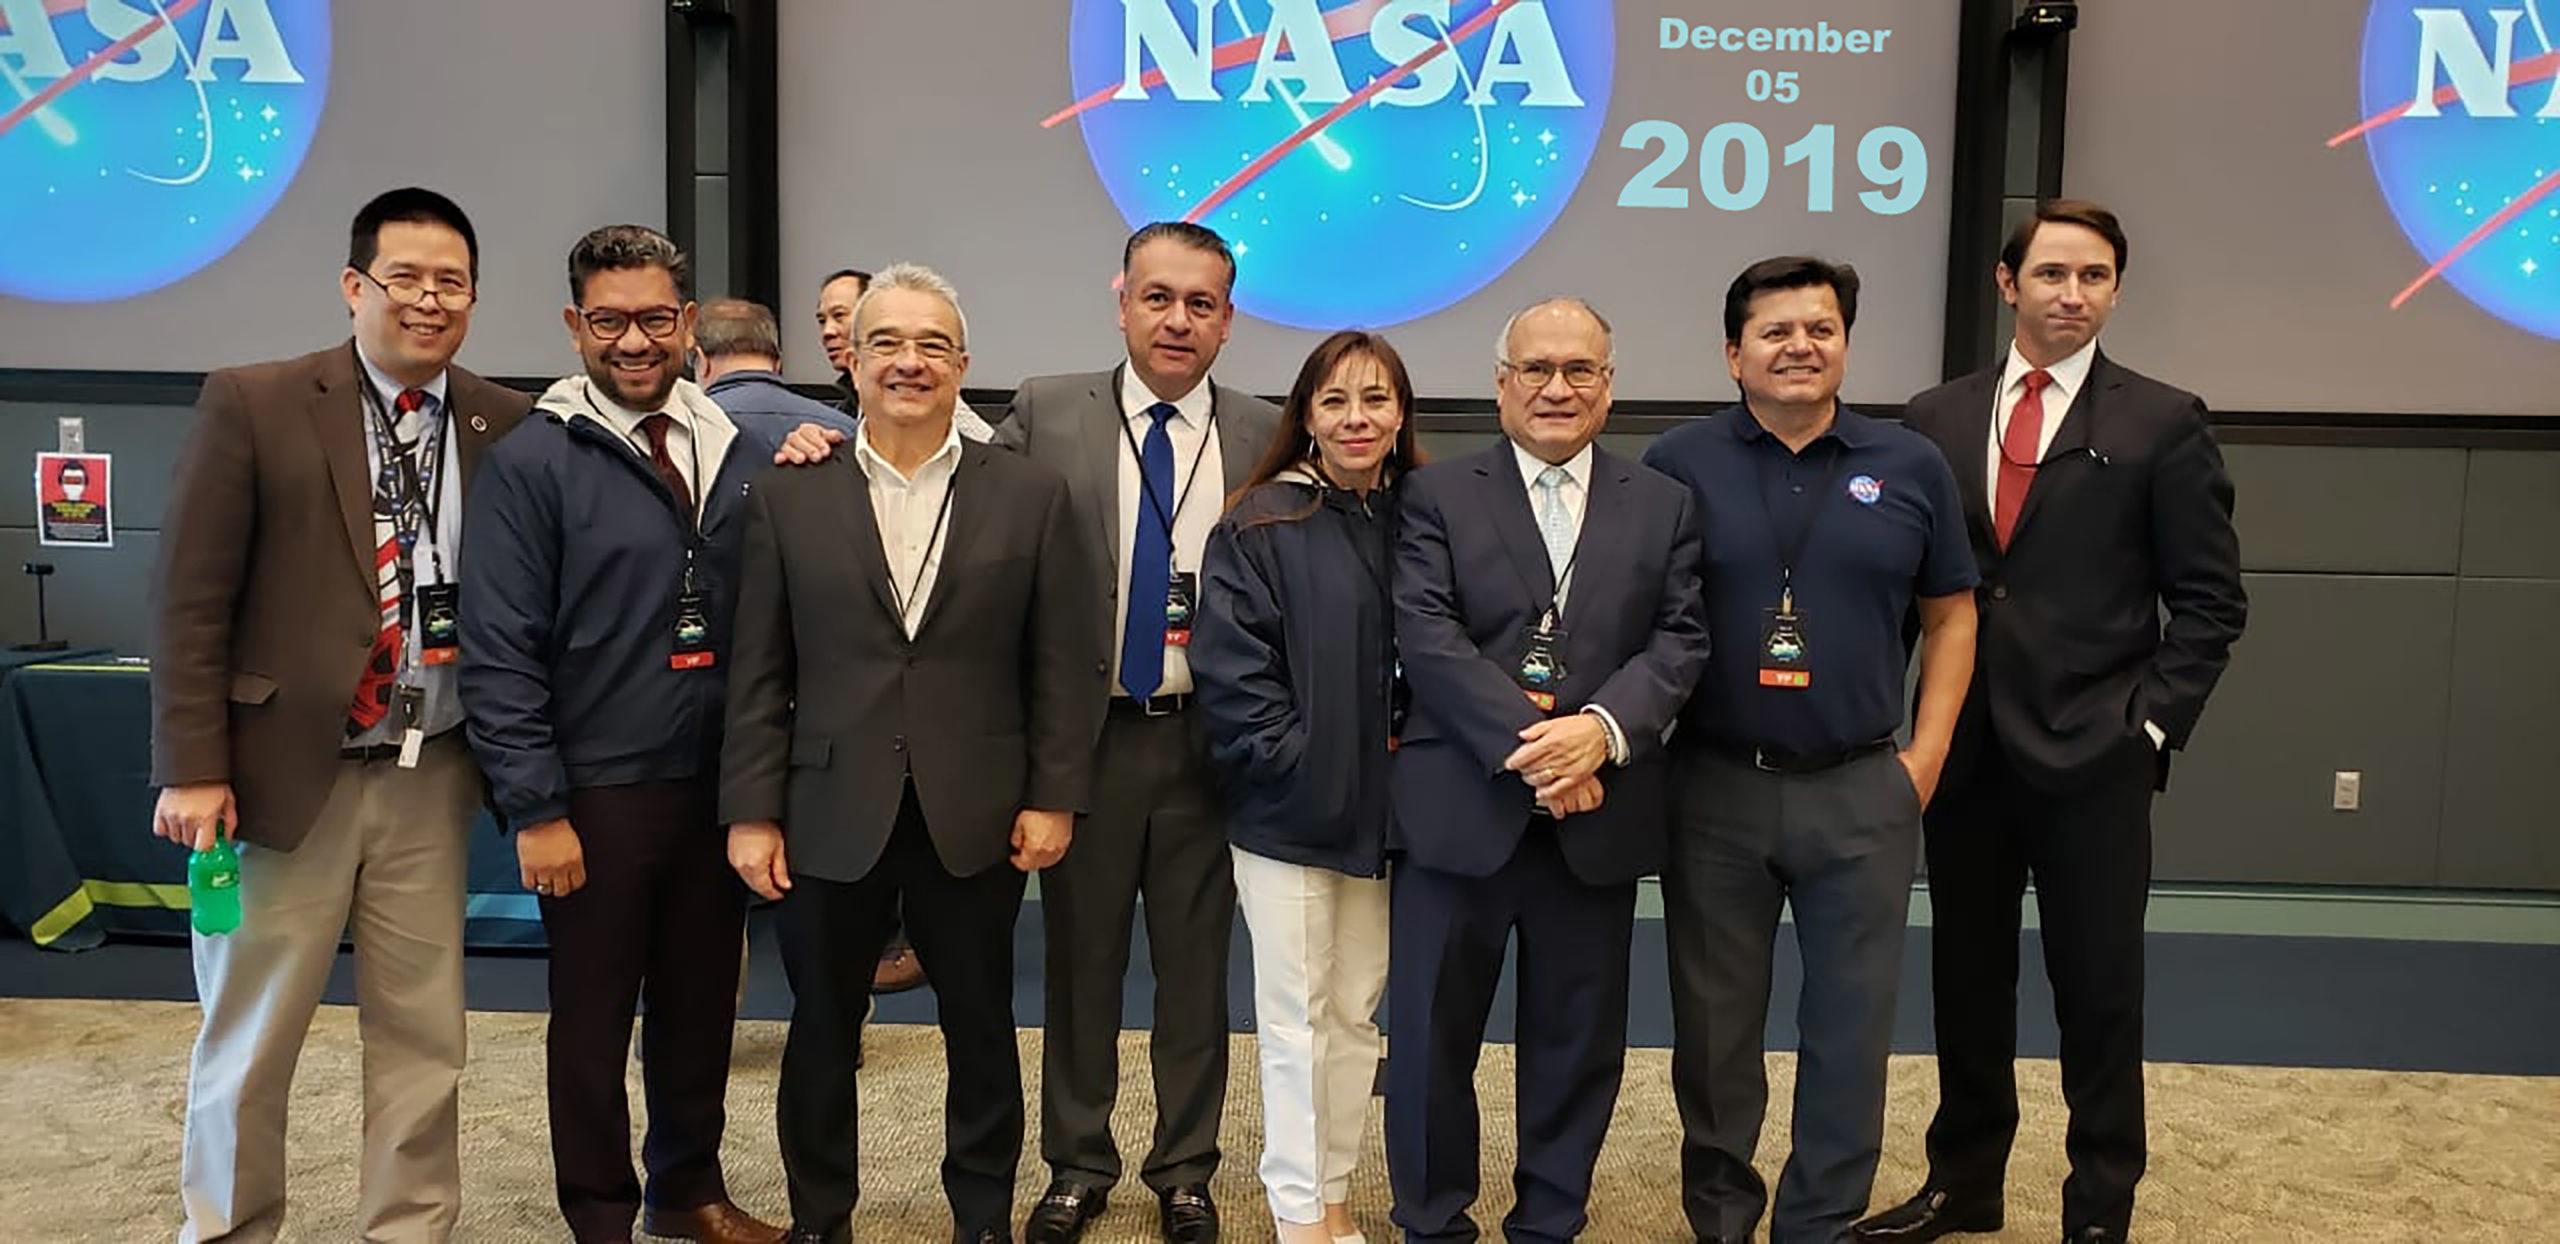 Fondo desaparecido por Morena financió centro espacial en Atlacomulco, bastión del PRI